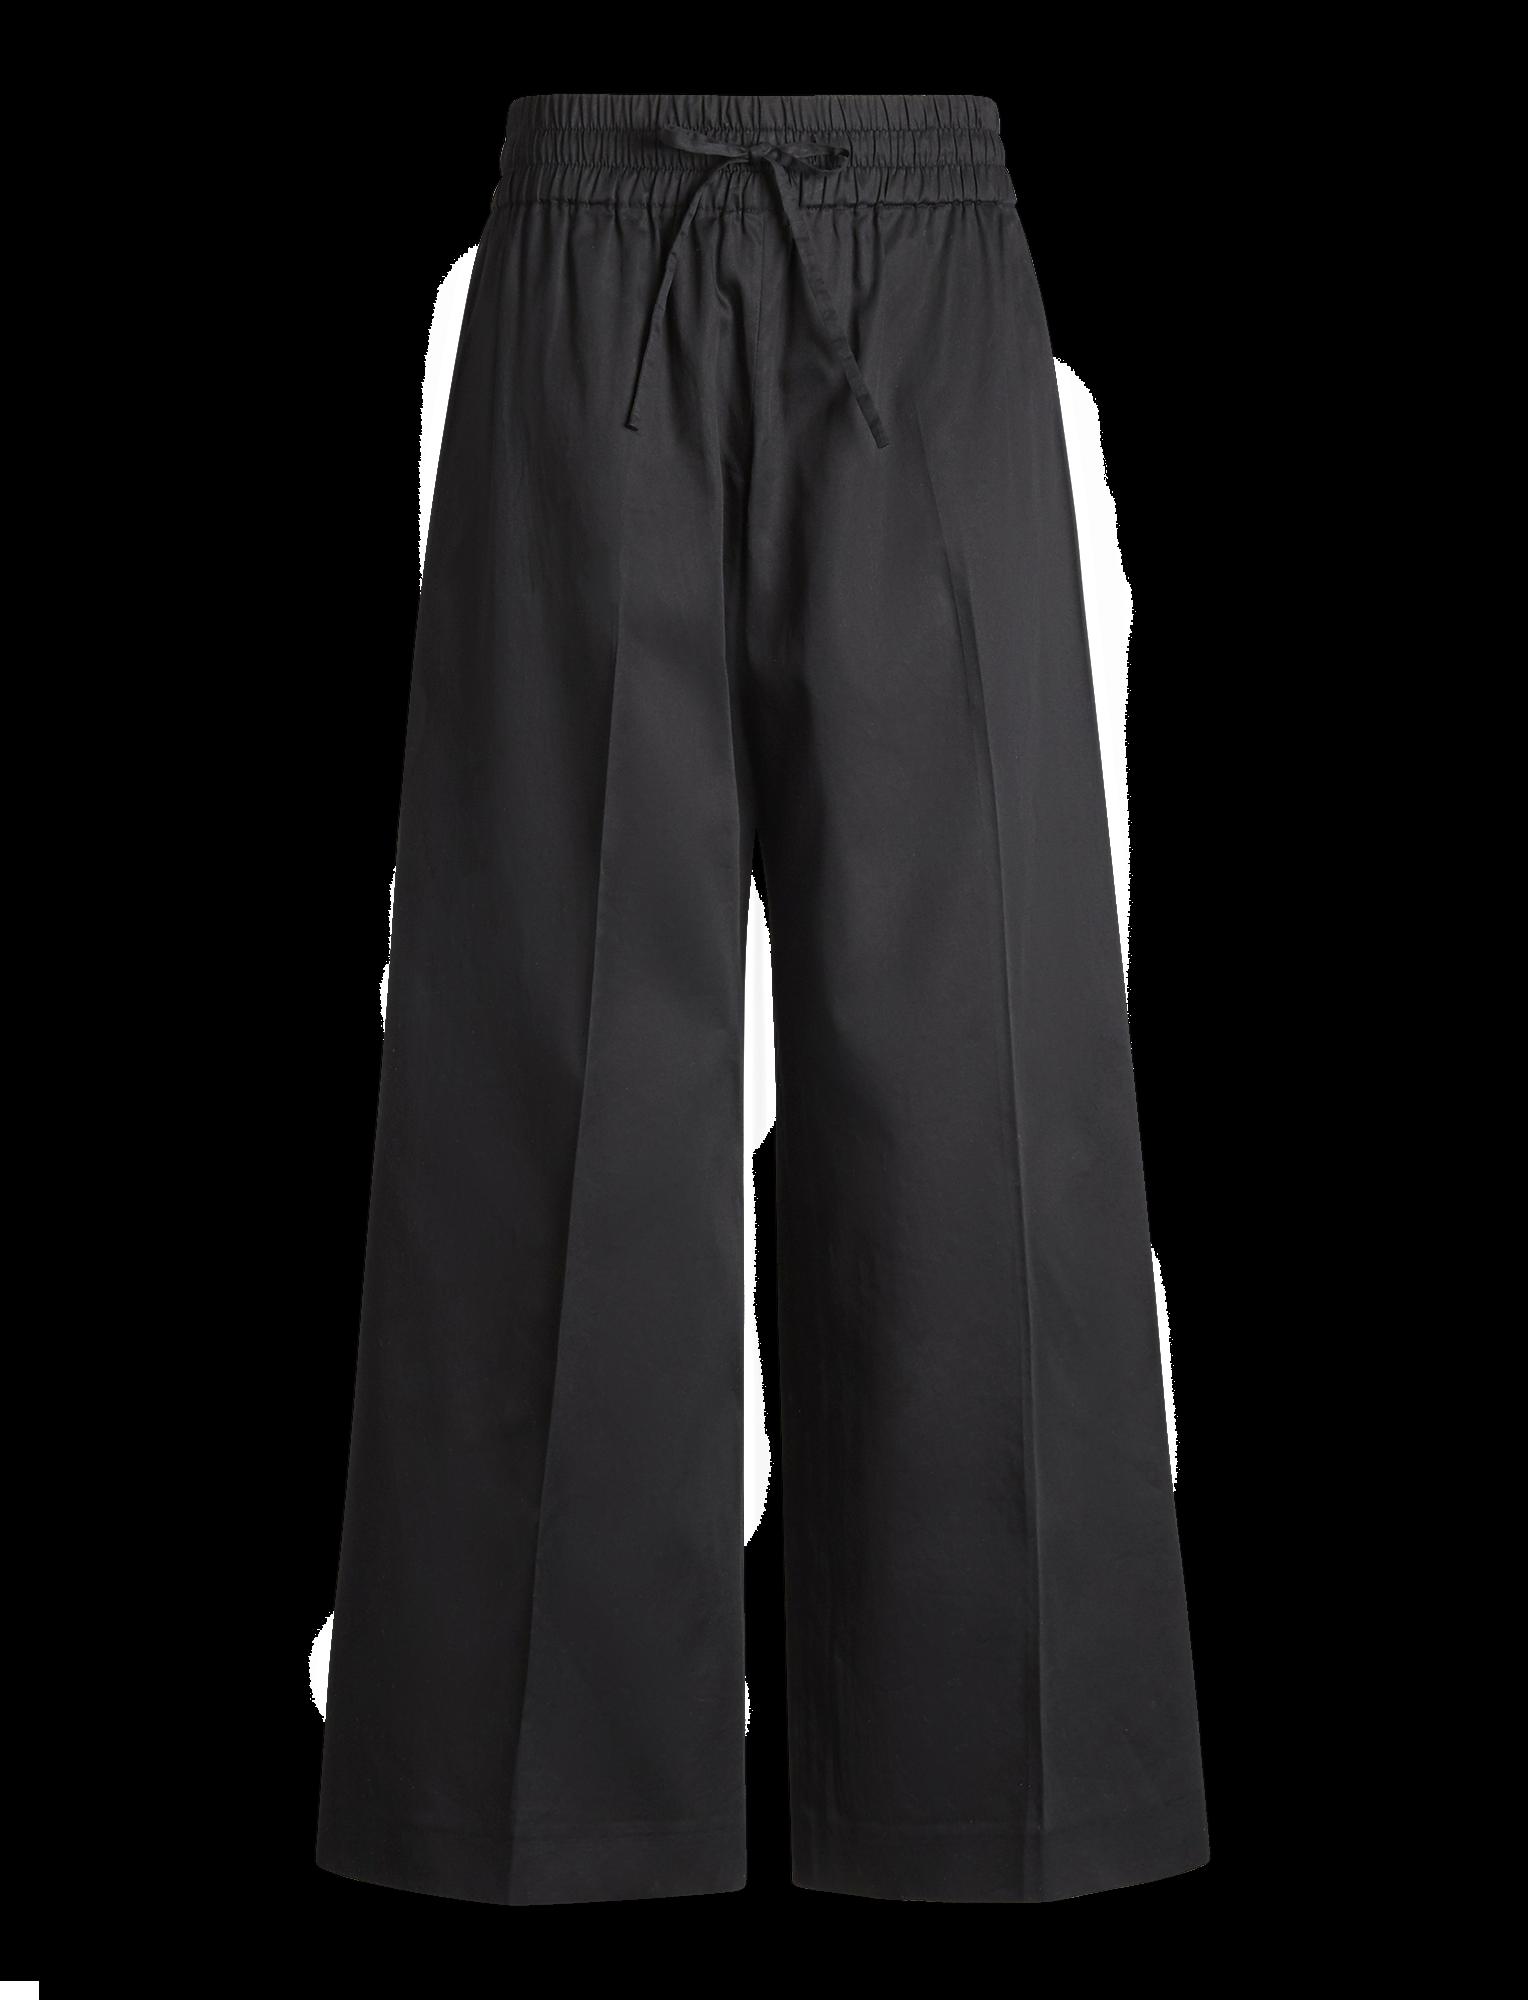 Joseph, Pantalon Dahlman en coton raffiné, in BLACK